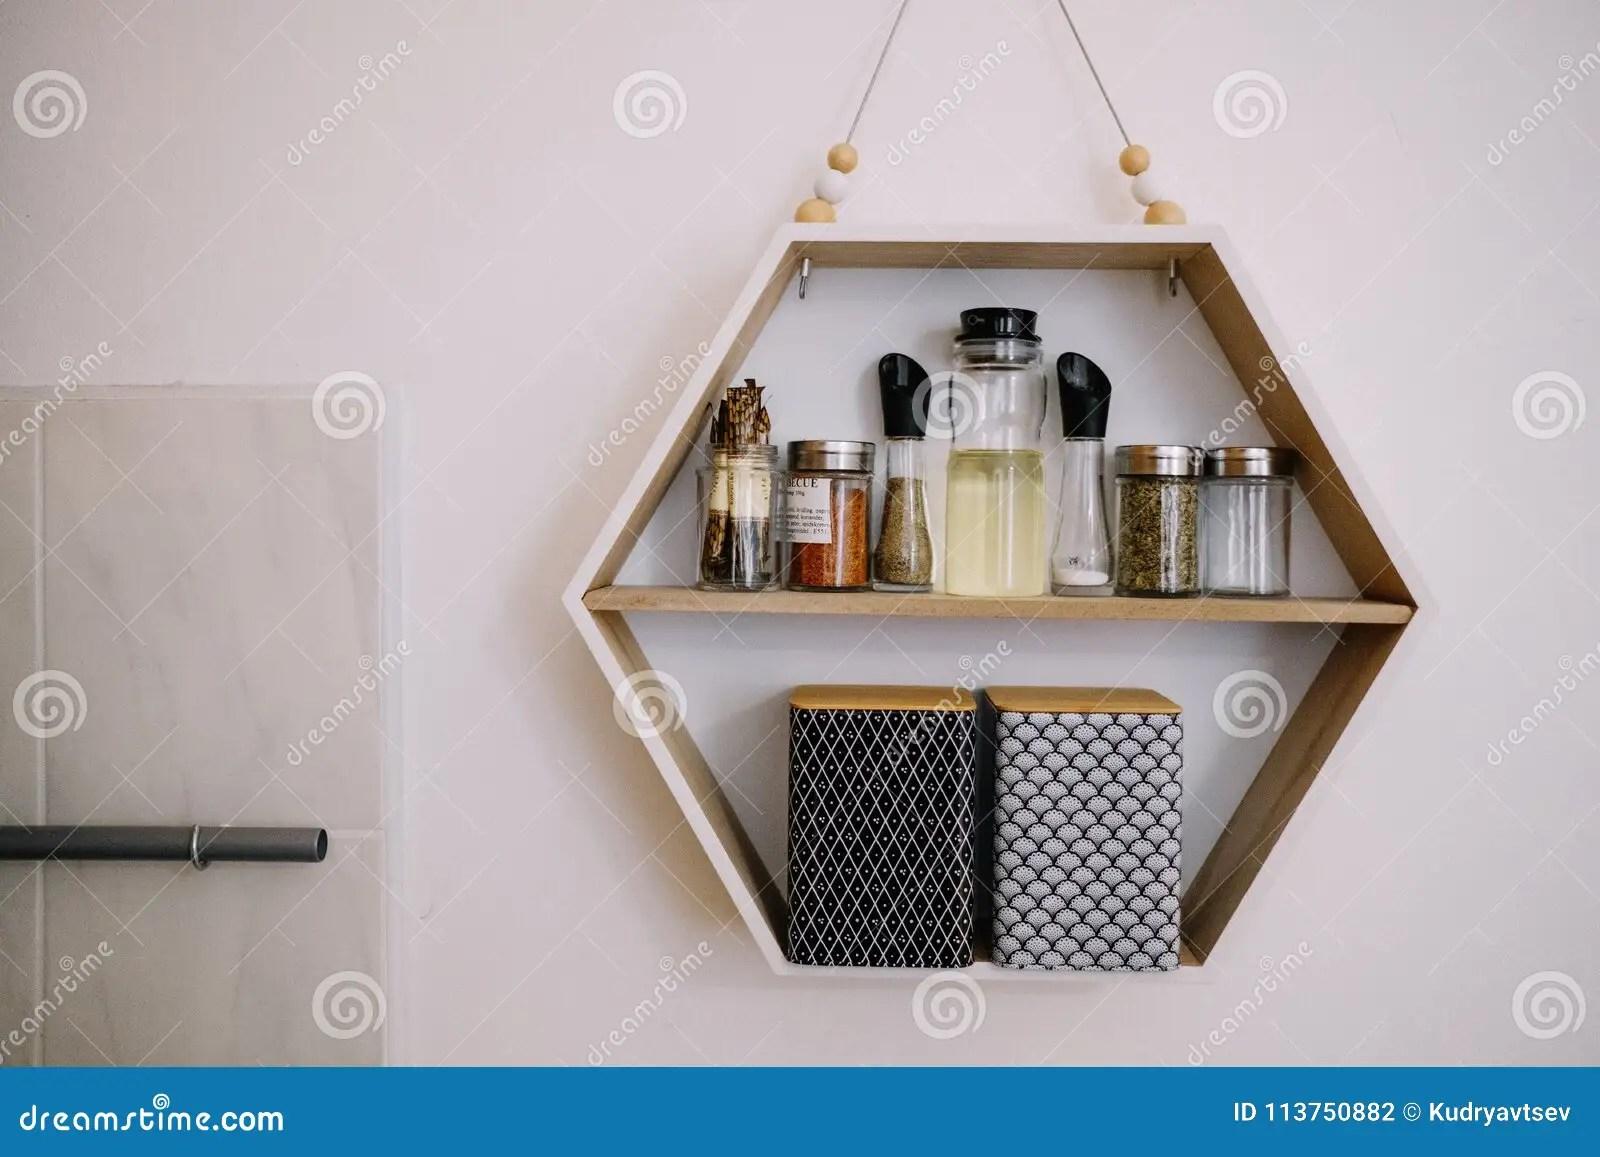 kitchen shelf decor counter top table sets 与香料瓶子的厨房架子库存照片 图片包括有瓶子 装饰 玻璃 器物 与香料瓶子的厨房架子